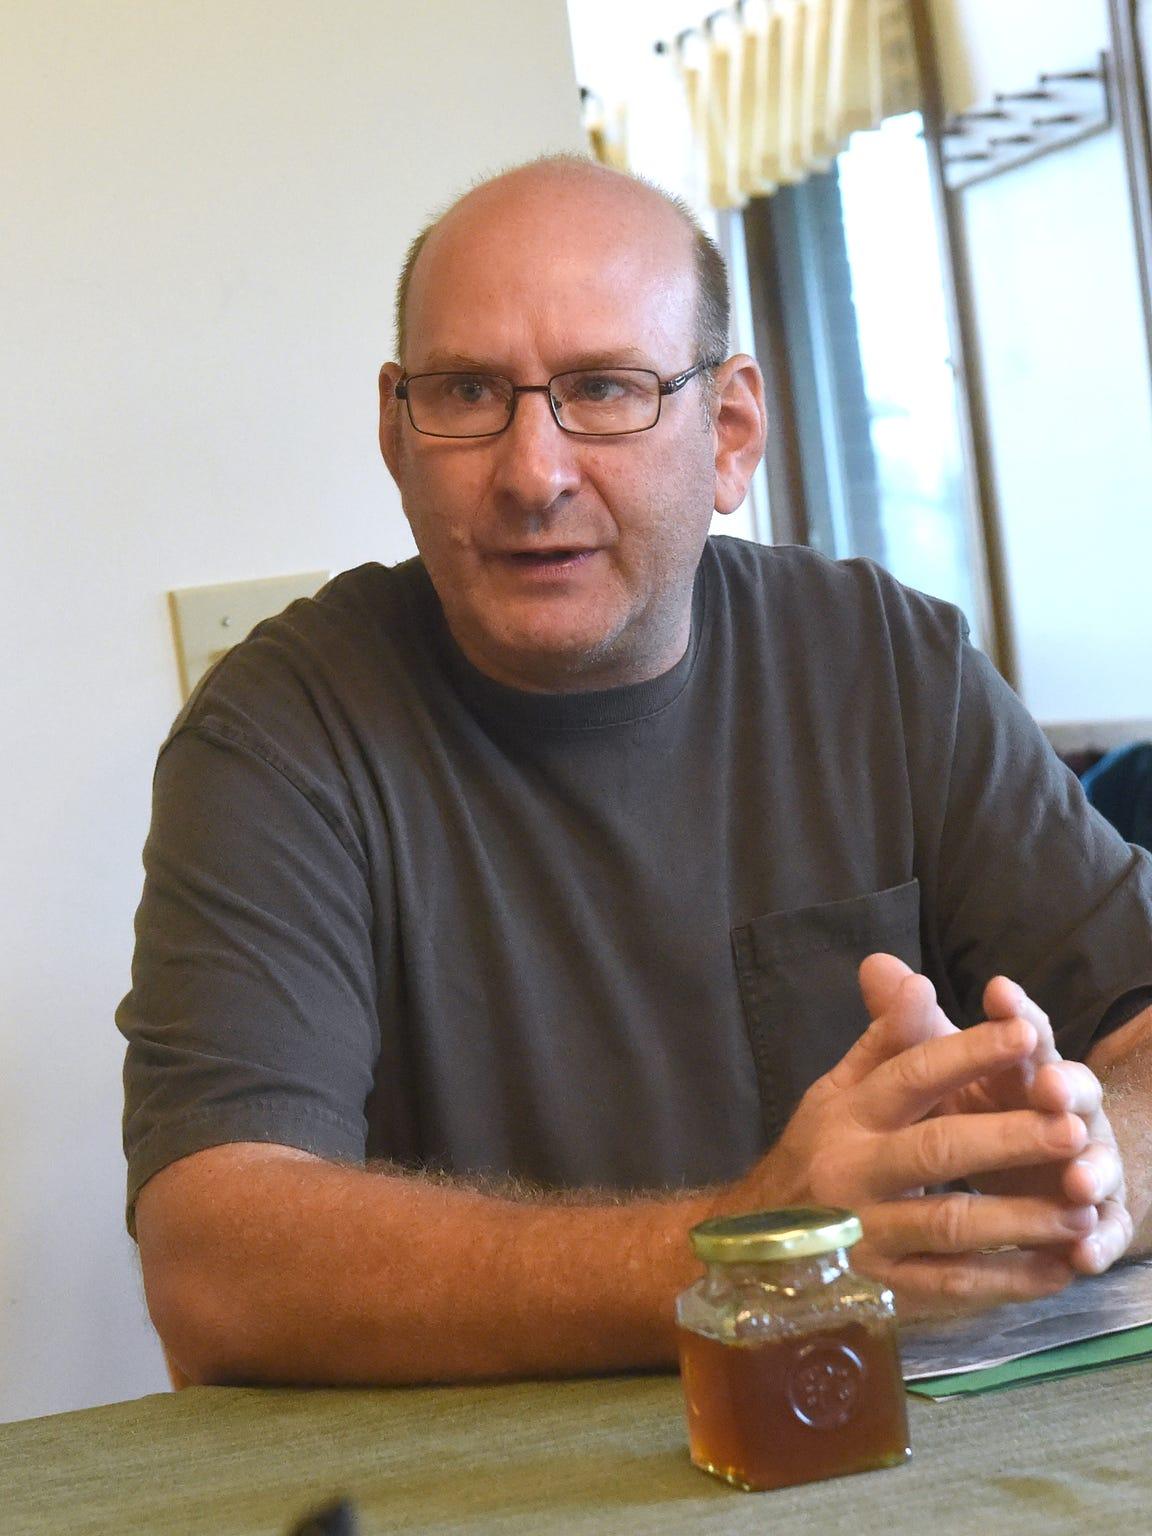 Glenn Rodes talks about the benefits of growing hemp